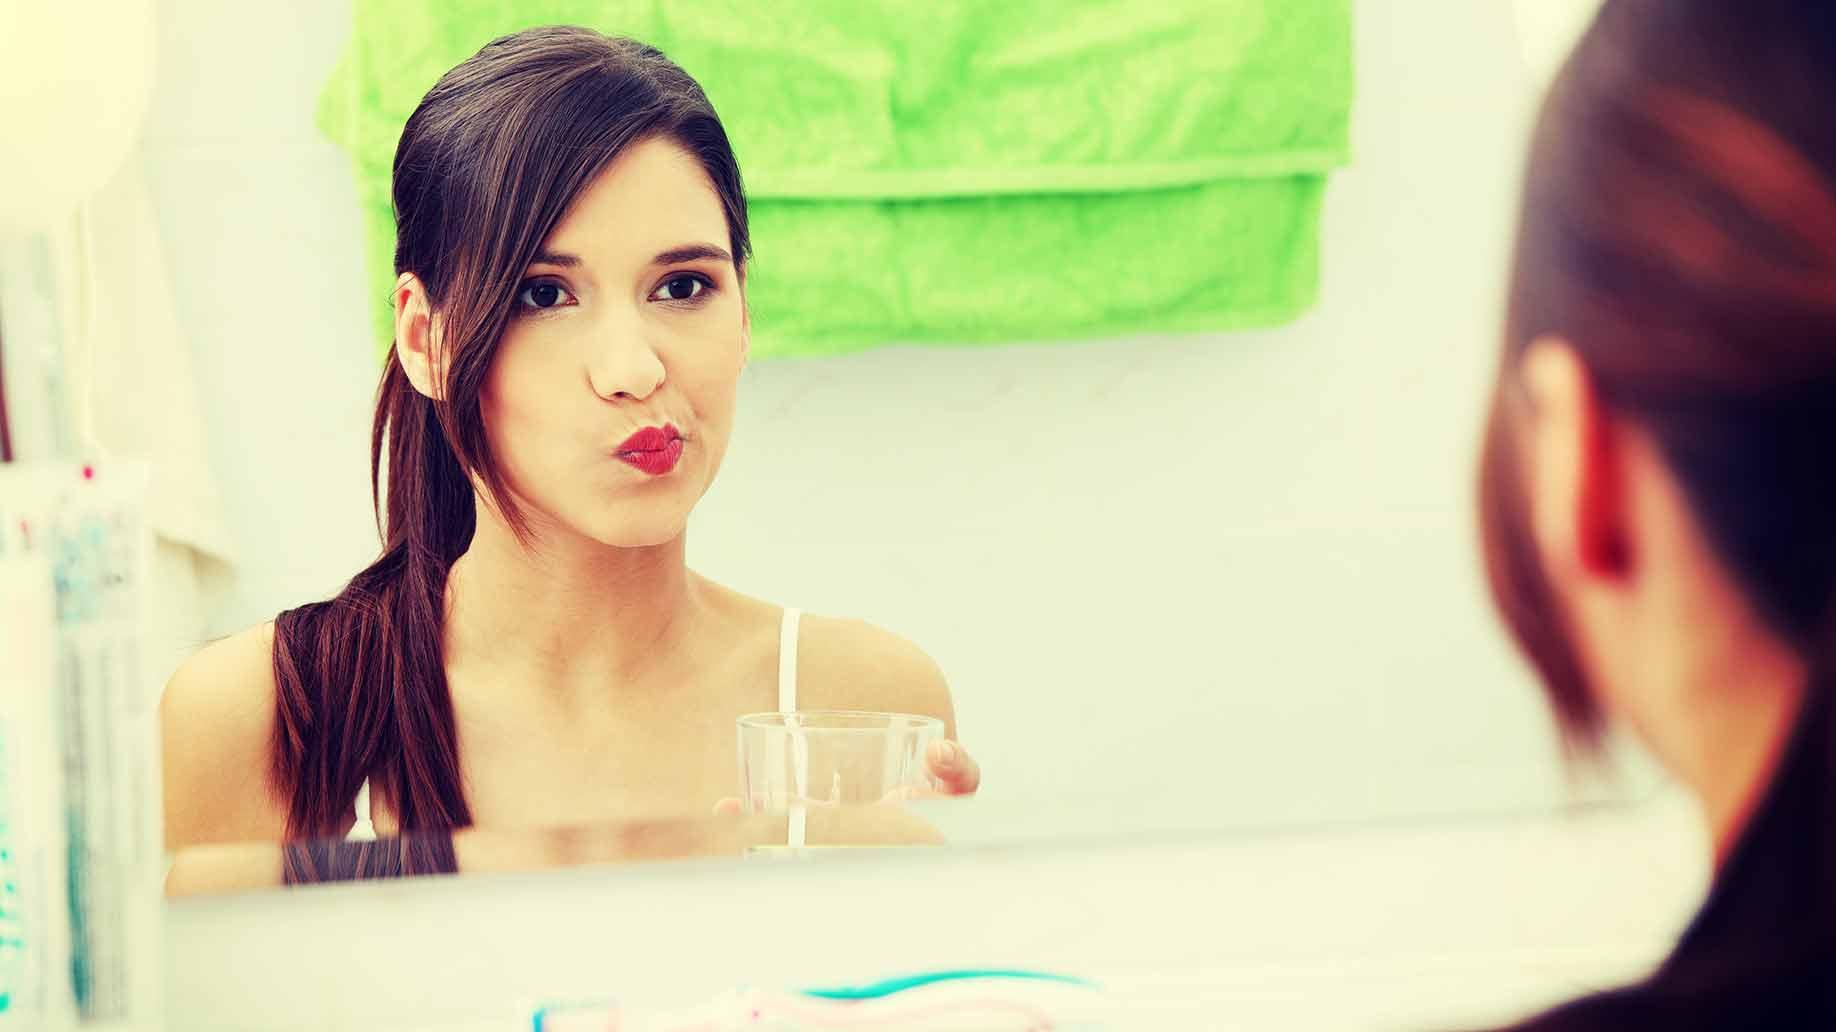 brush properly bad breath halitosis get rid of naturally